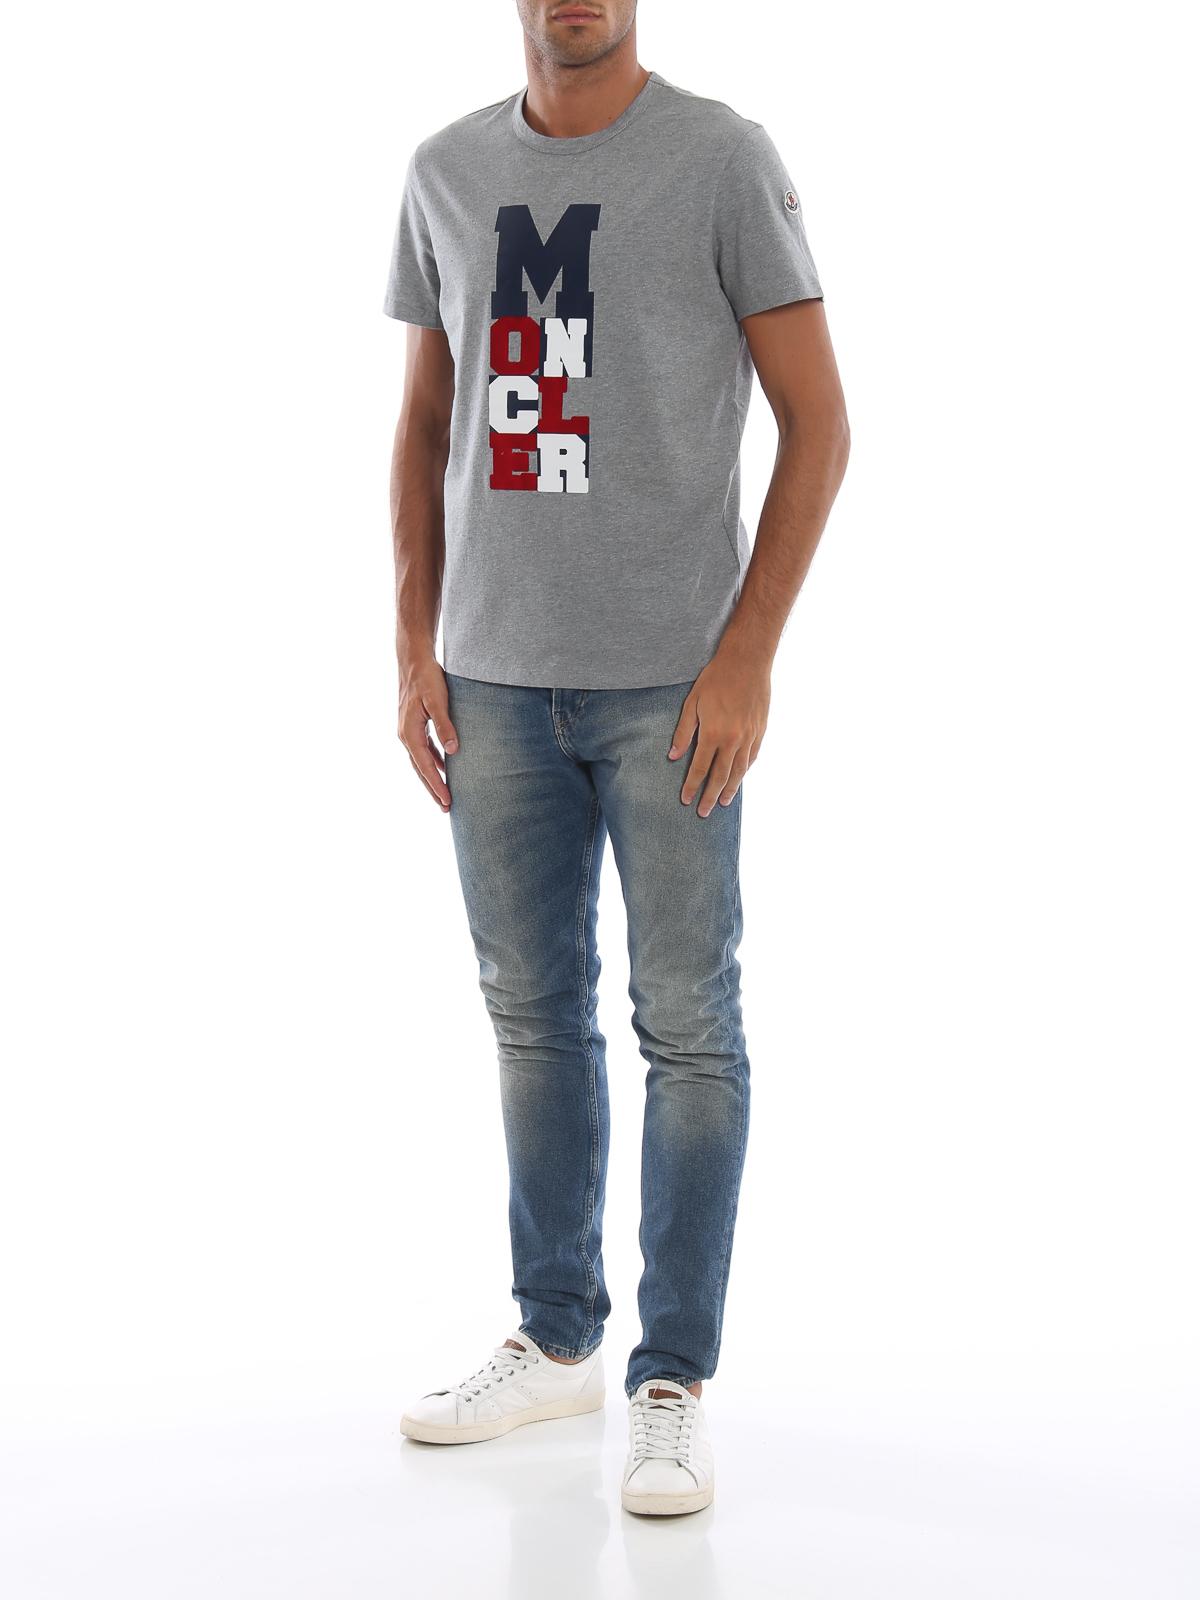 a5156235f6ca Moncler - Rubberized tricolour logo print grey T-shirt - t-shirts ...